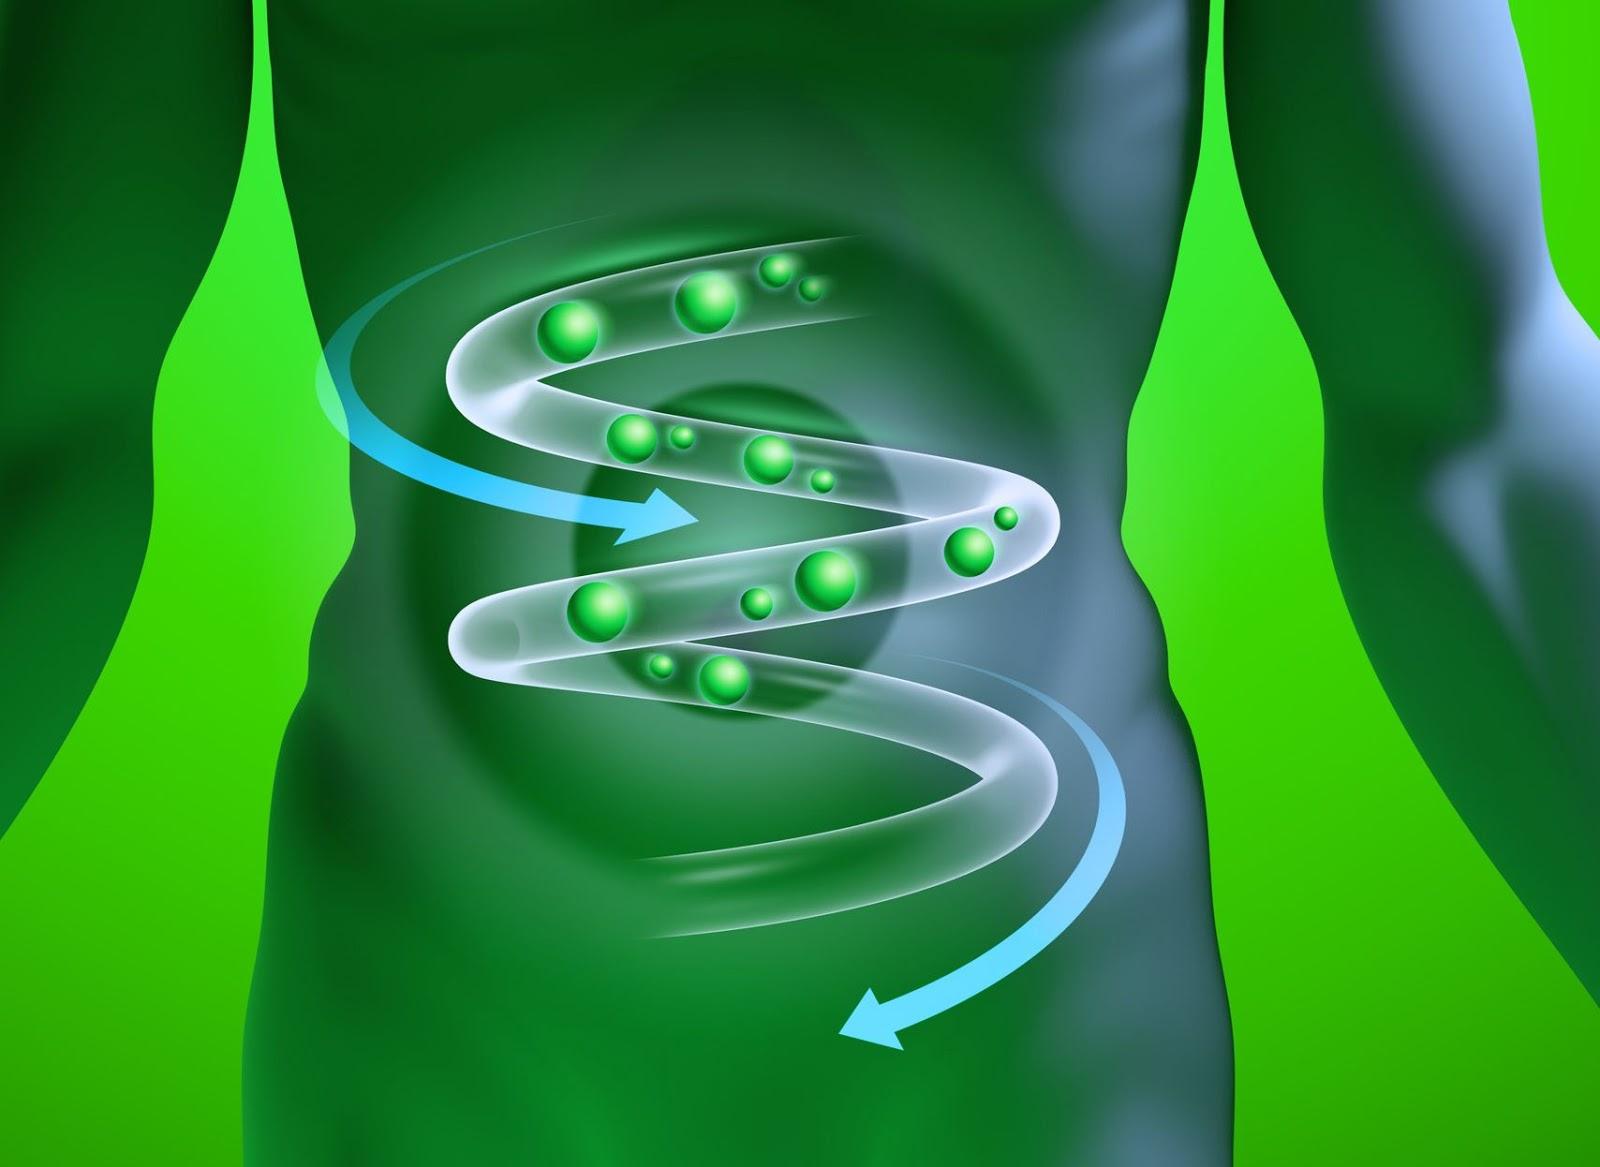 GUT-Screening:Test della flora intestinale